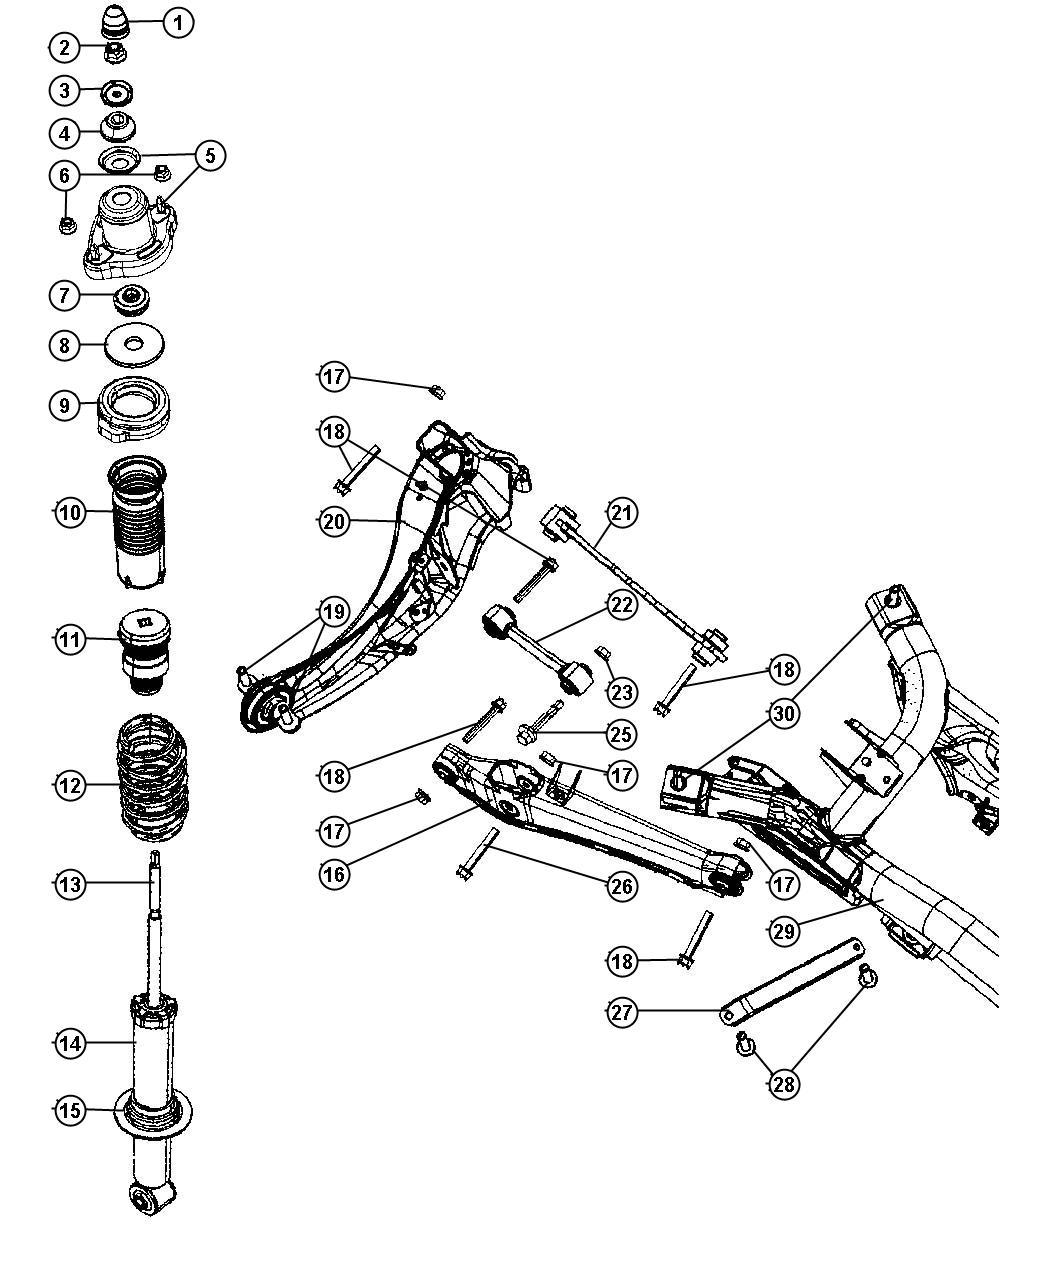 2013 Audi A4 Fuse Box. Audi. Auto Fuse Box Diagram